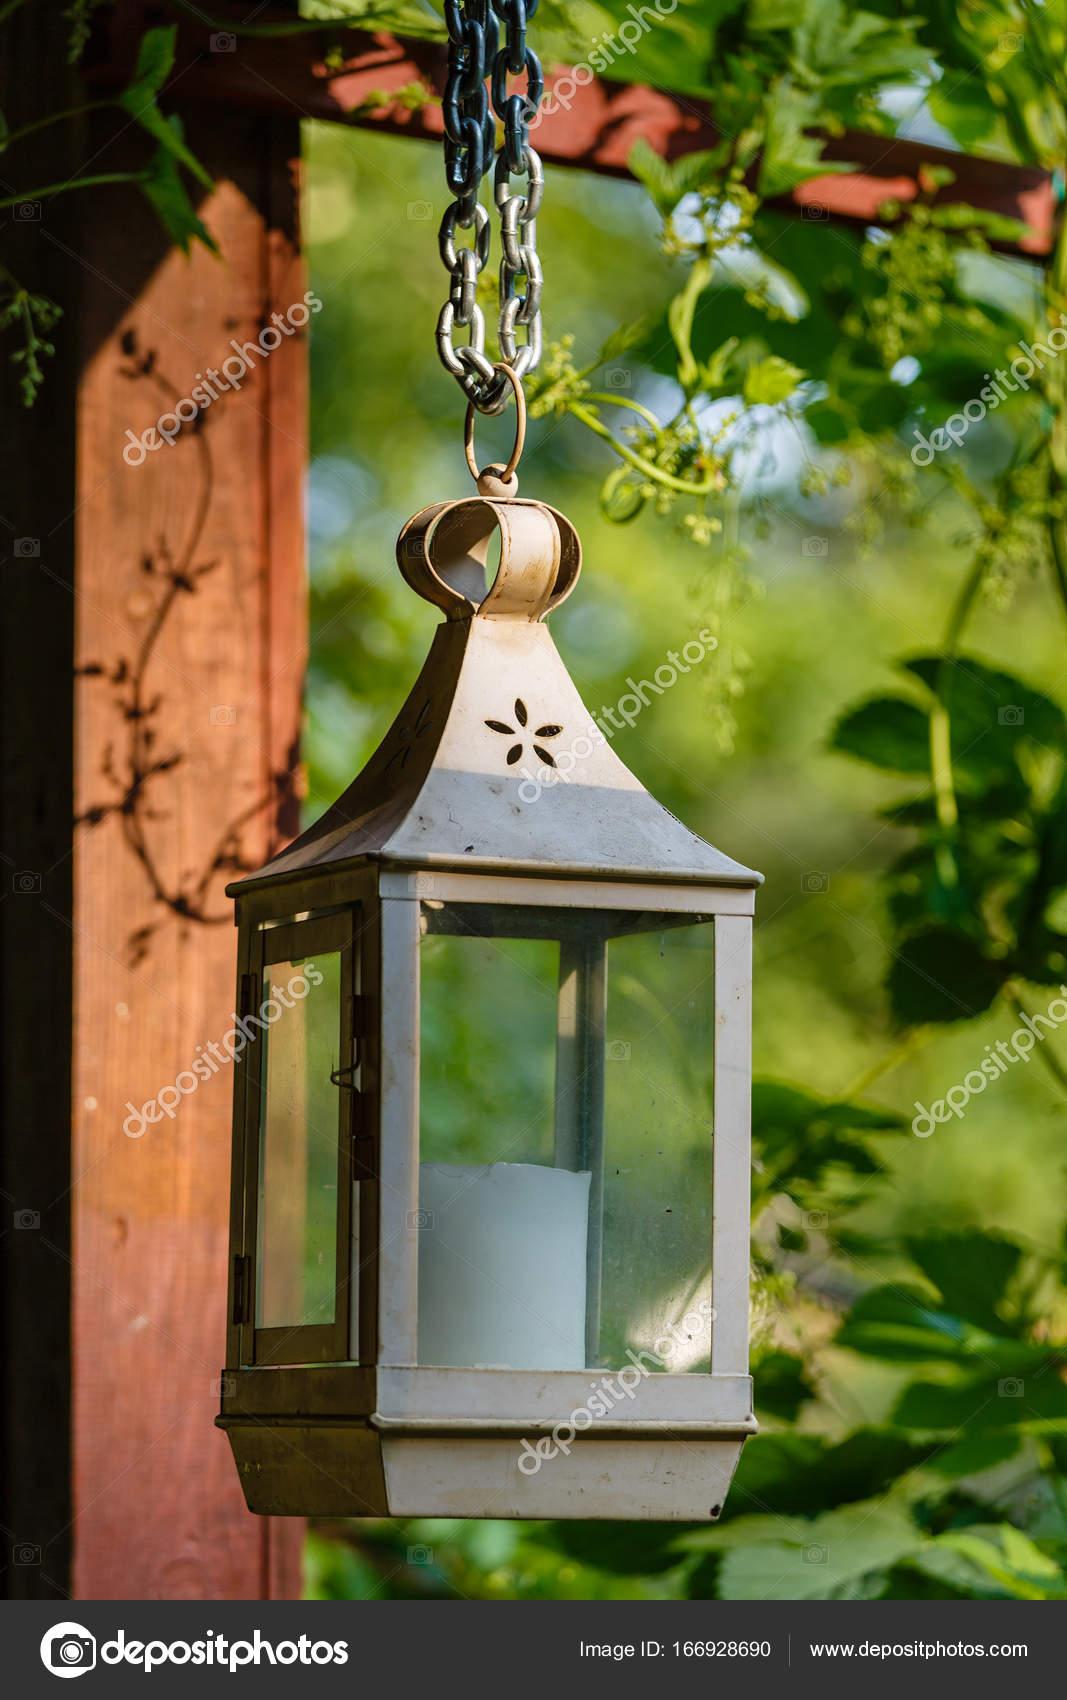 Lampe ancienne avec bougie — Photographie psvrusso © #166928690